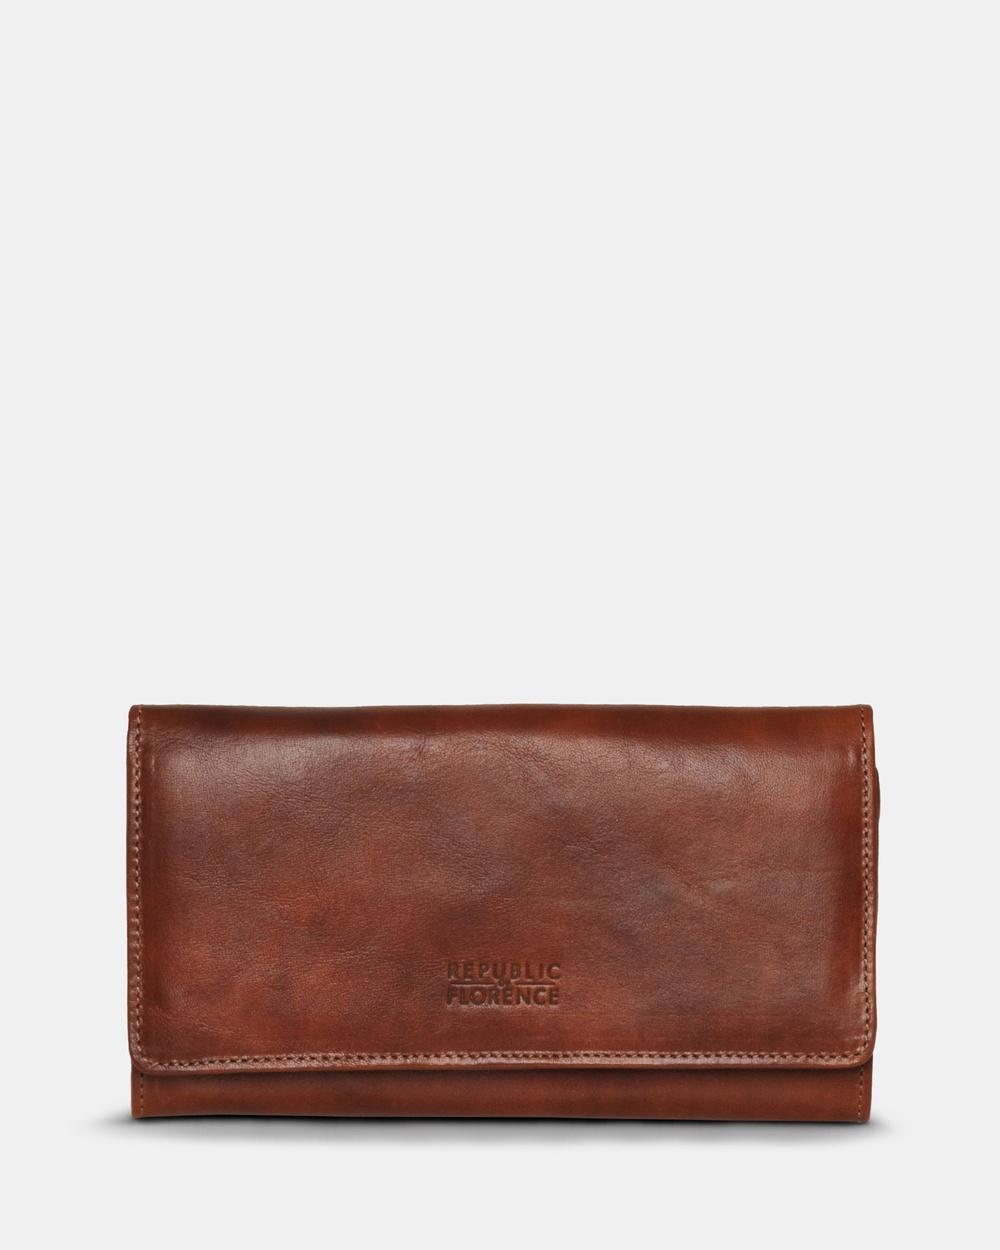 Florence Carmen Leather Wallet Wallets Brown